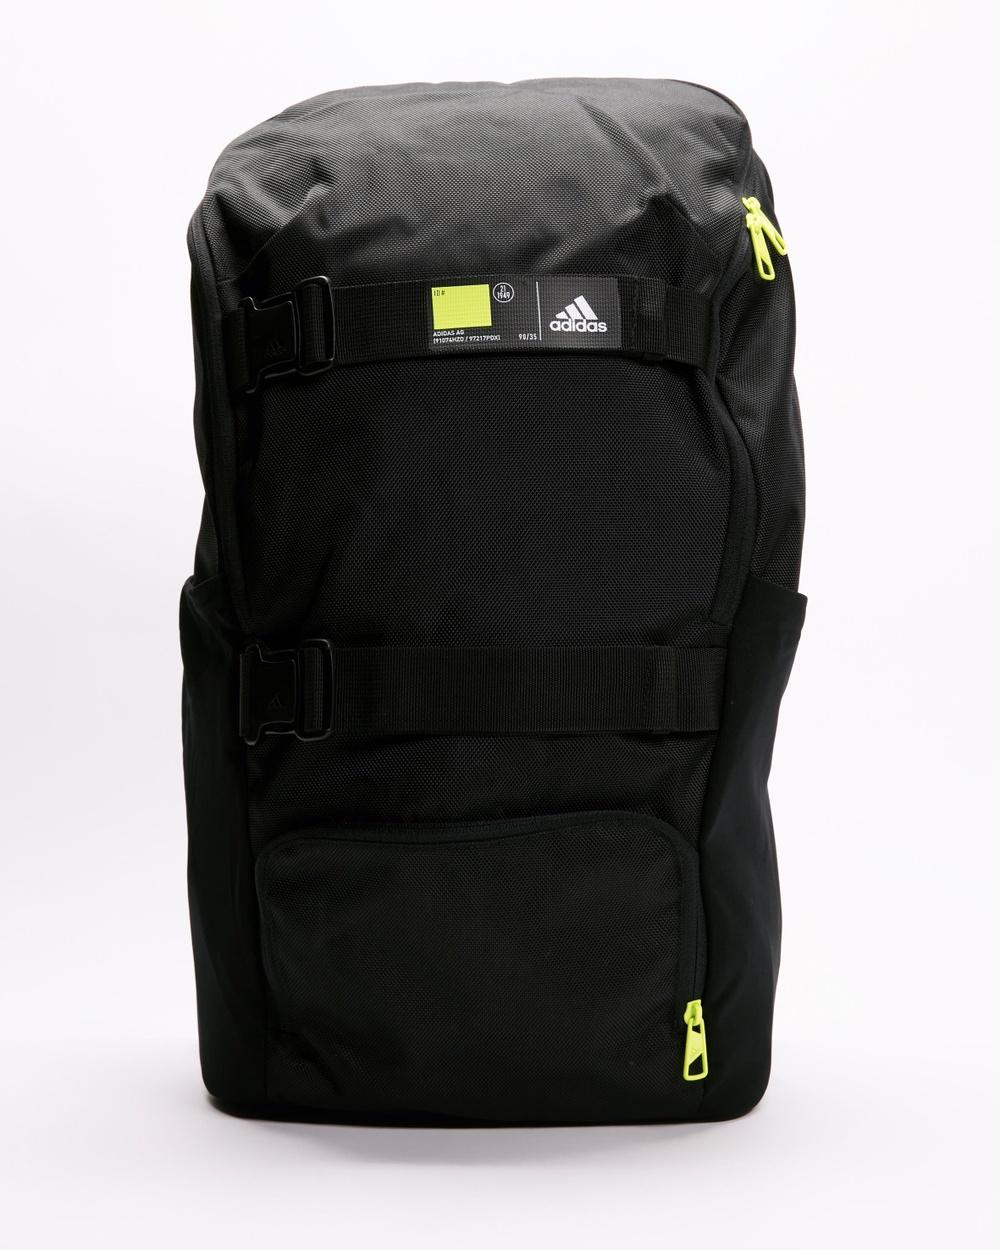 adidas Performance 4 ATHLTS Backpack Backpacks Black